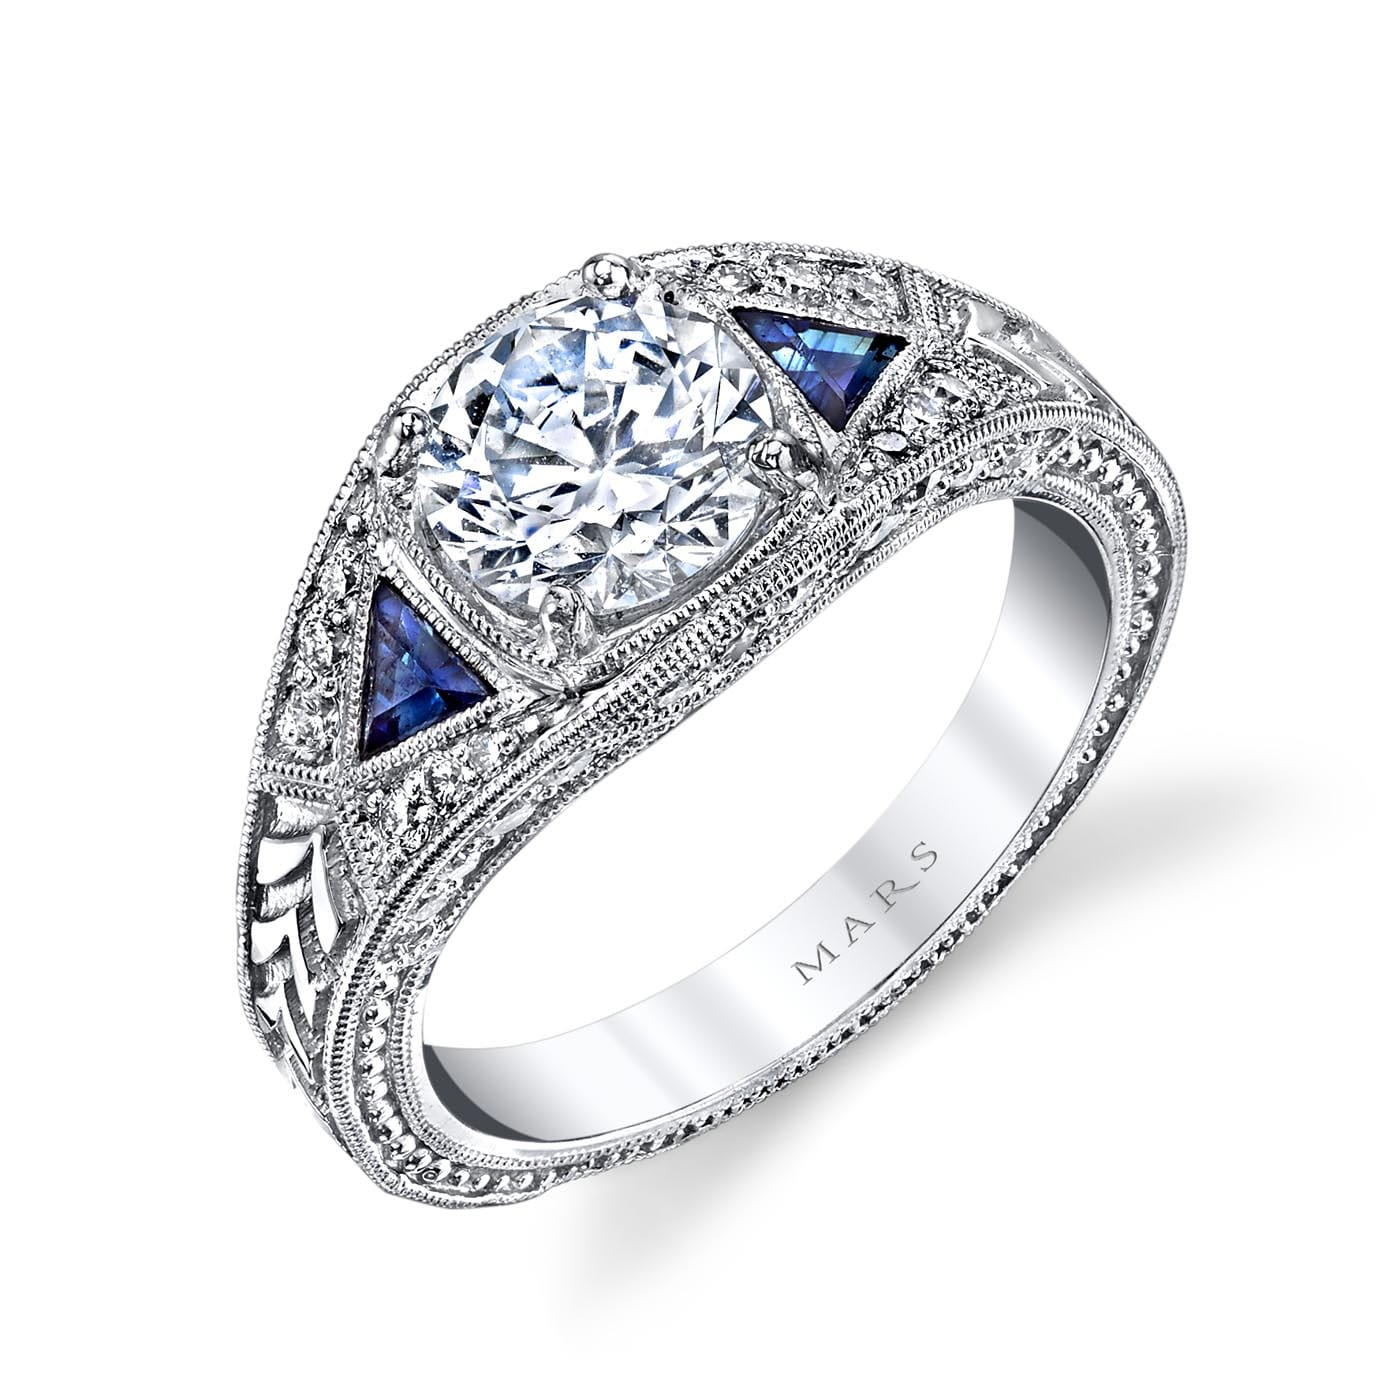 Three_Stone Engagement RingStyle #: MARS 14586